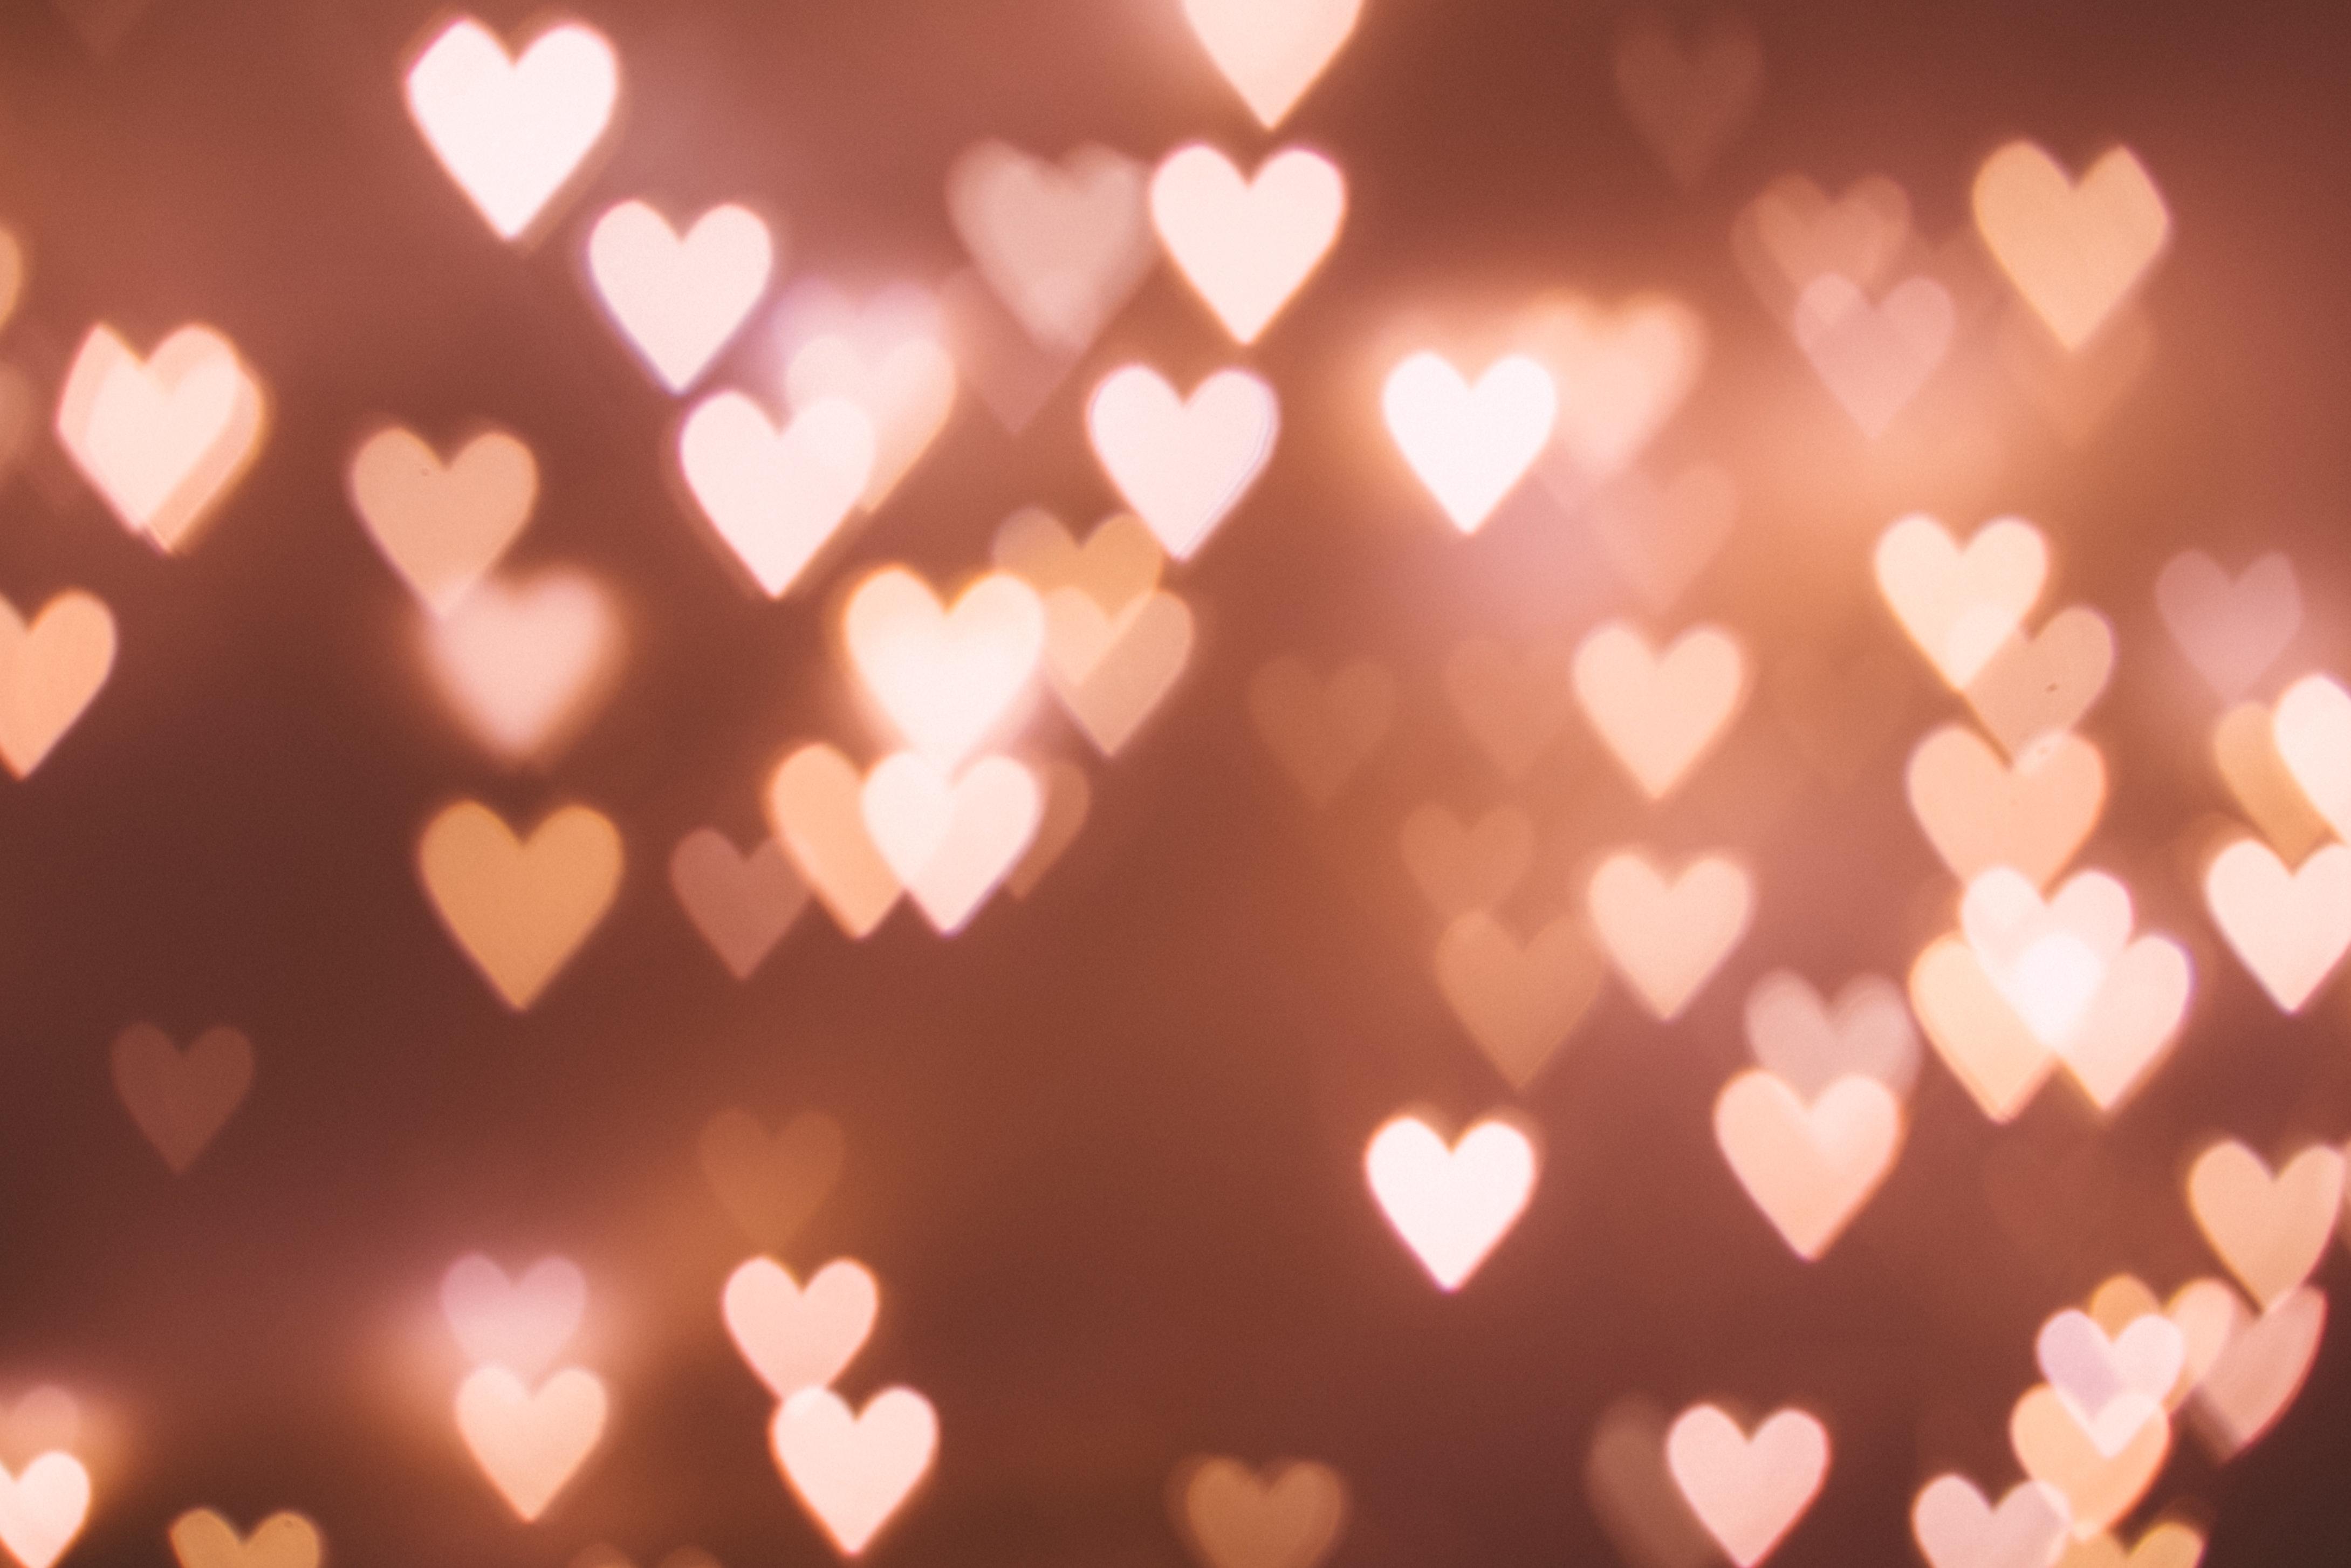 сердечки на картинки эффекты